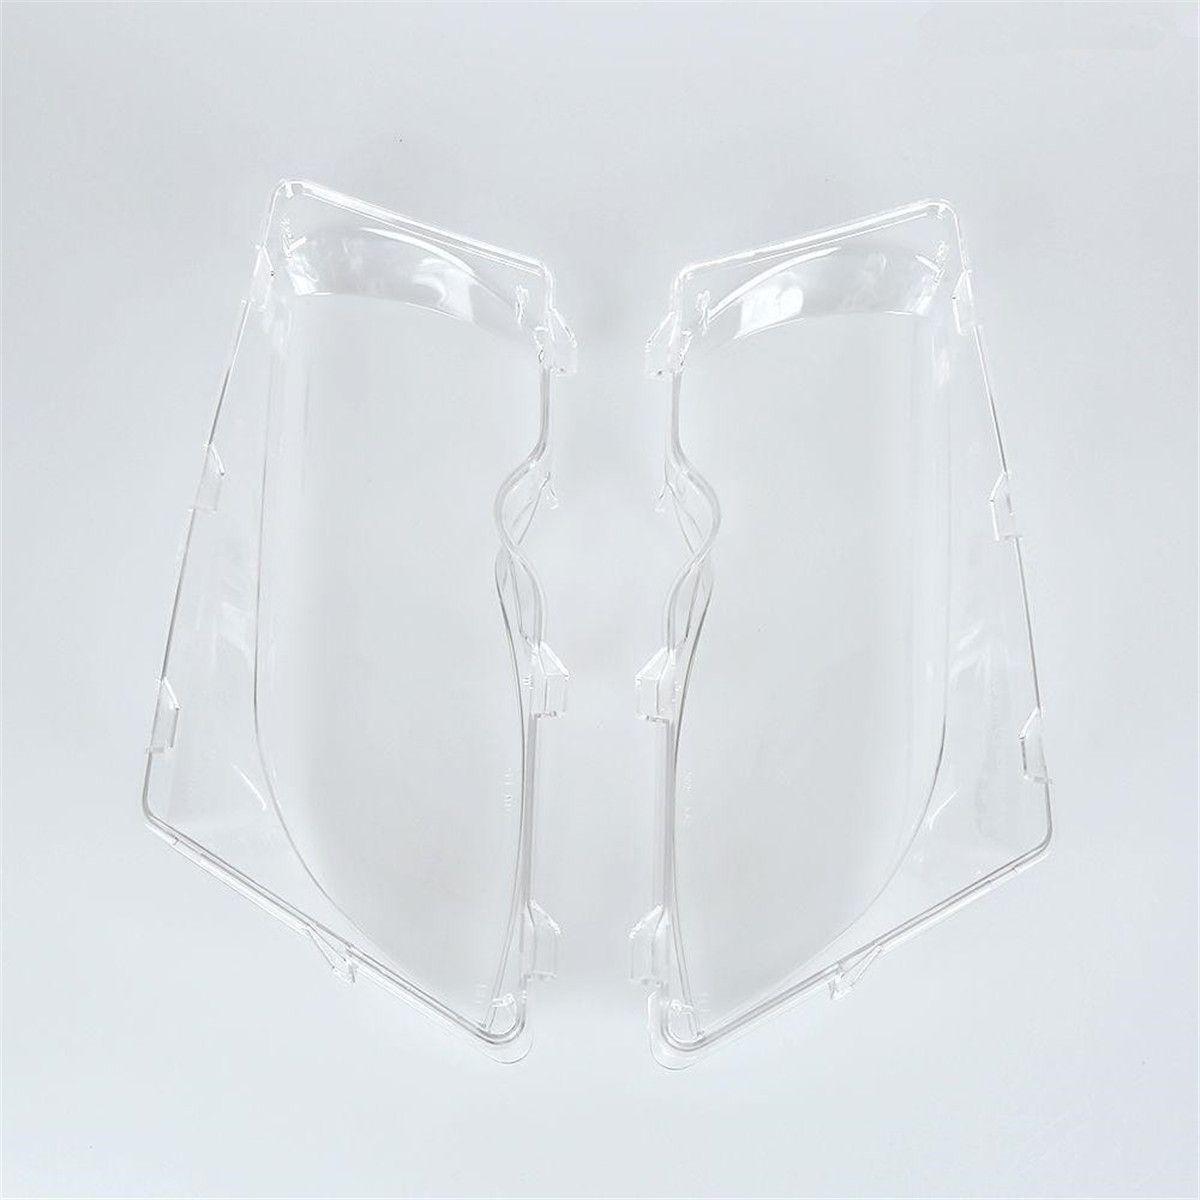 2 Pcs Auto Lichter Scheinwerfer Objektiv Shell Lampe Abdeckung Ersatz Glas Für BMW E46 318i/320i/325i/ 325xi/330i/330xi (2002-2005)